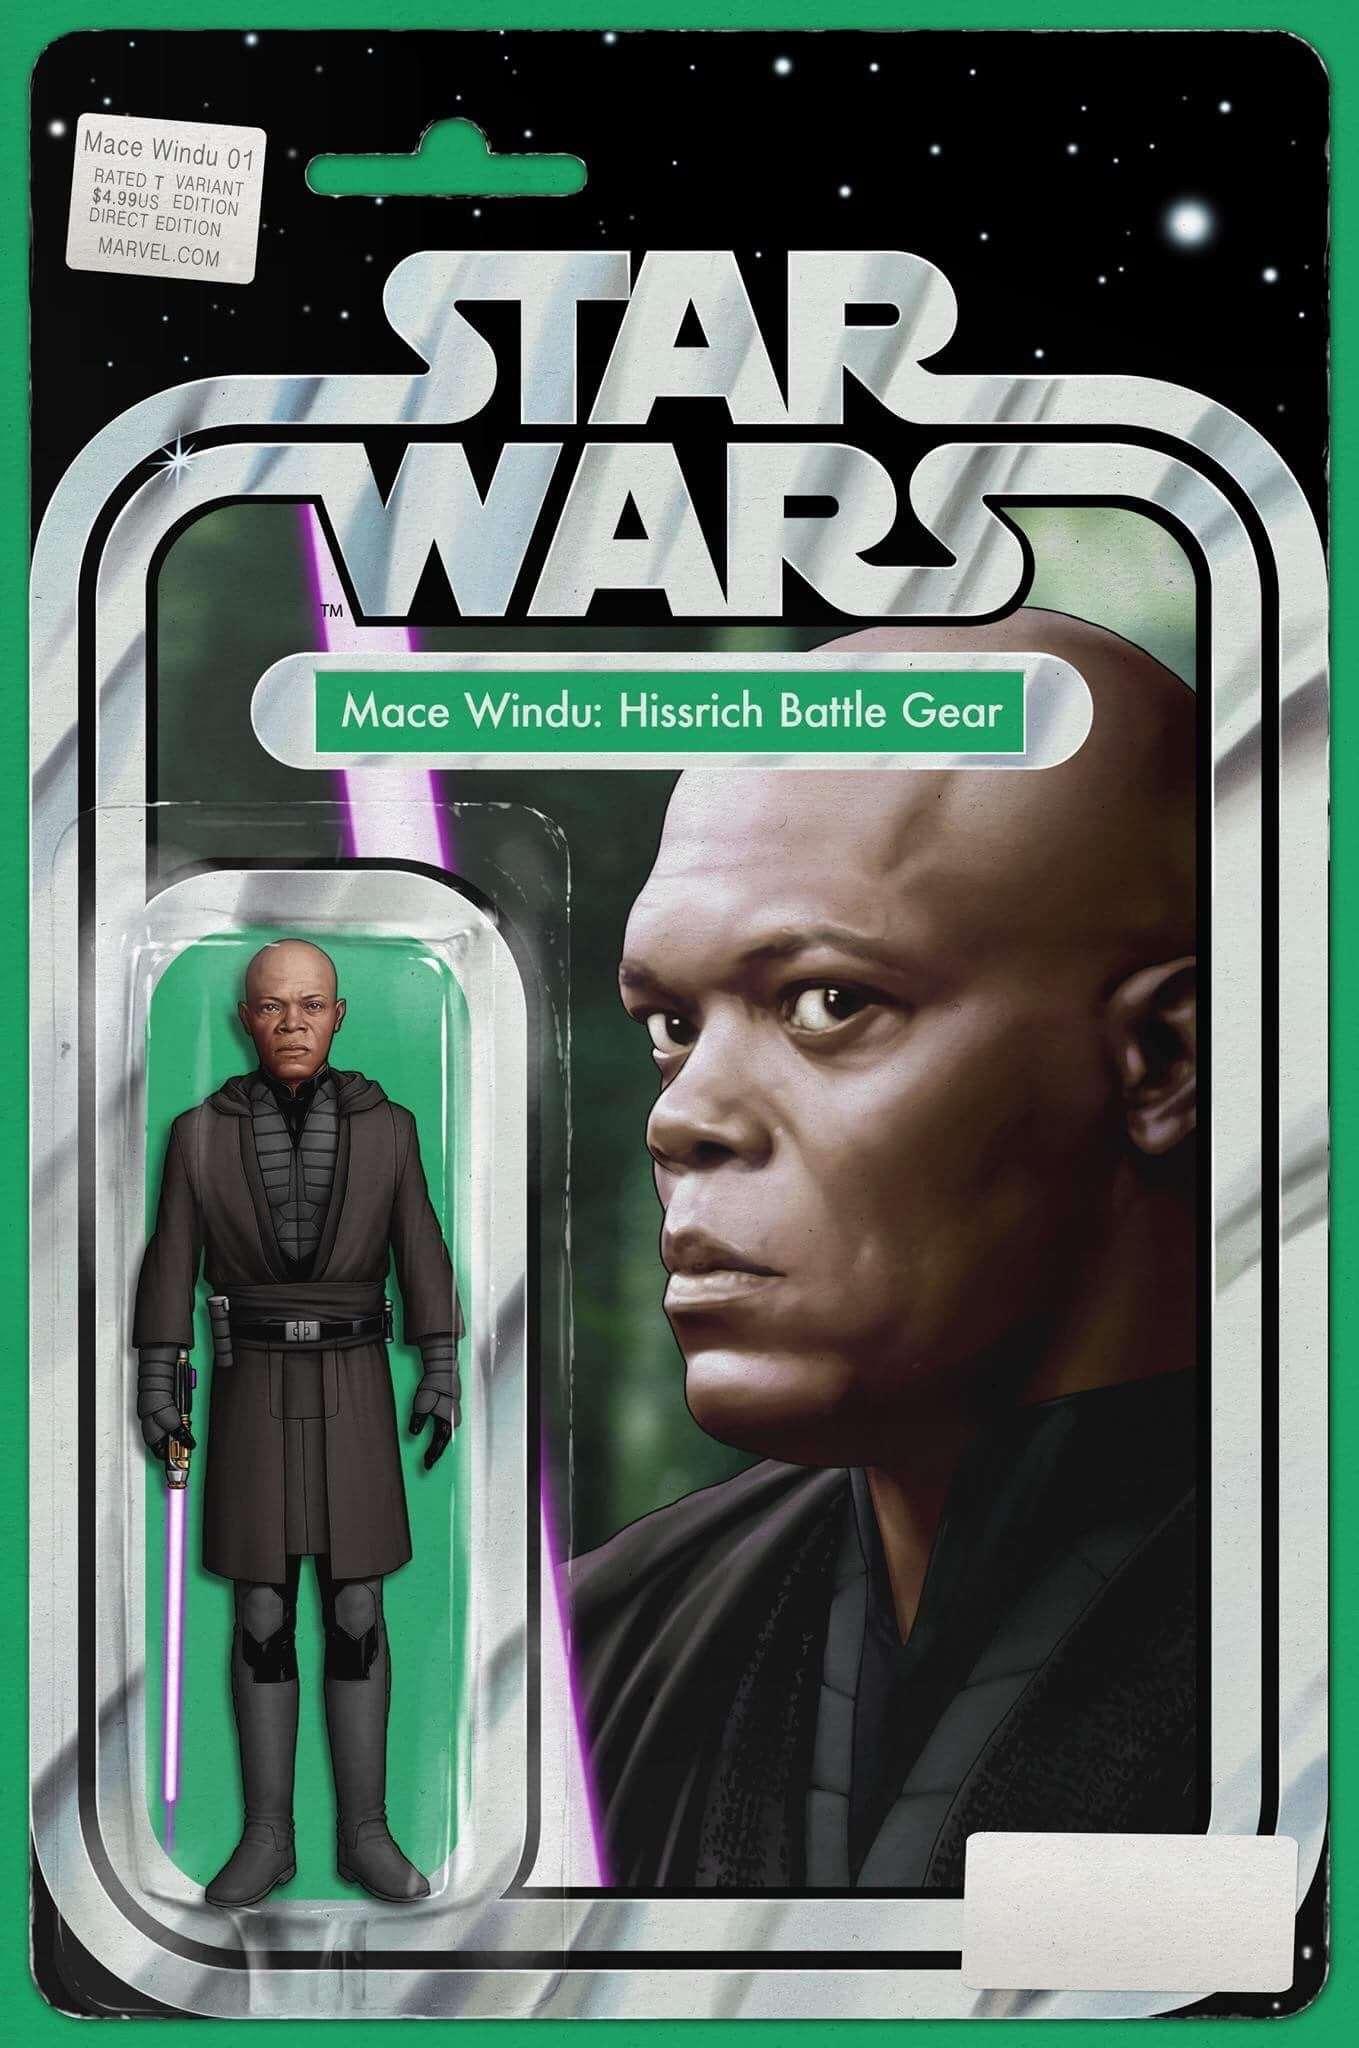 Mace Windu: Jedi of the Republic #1 Action figure variant